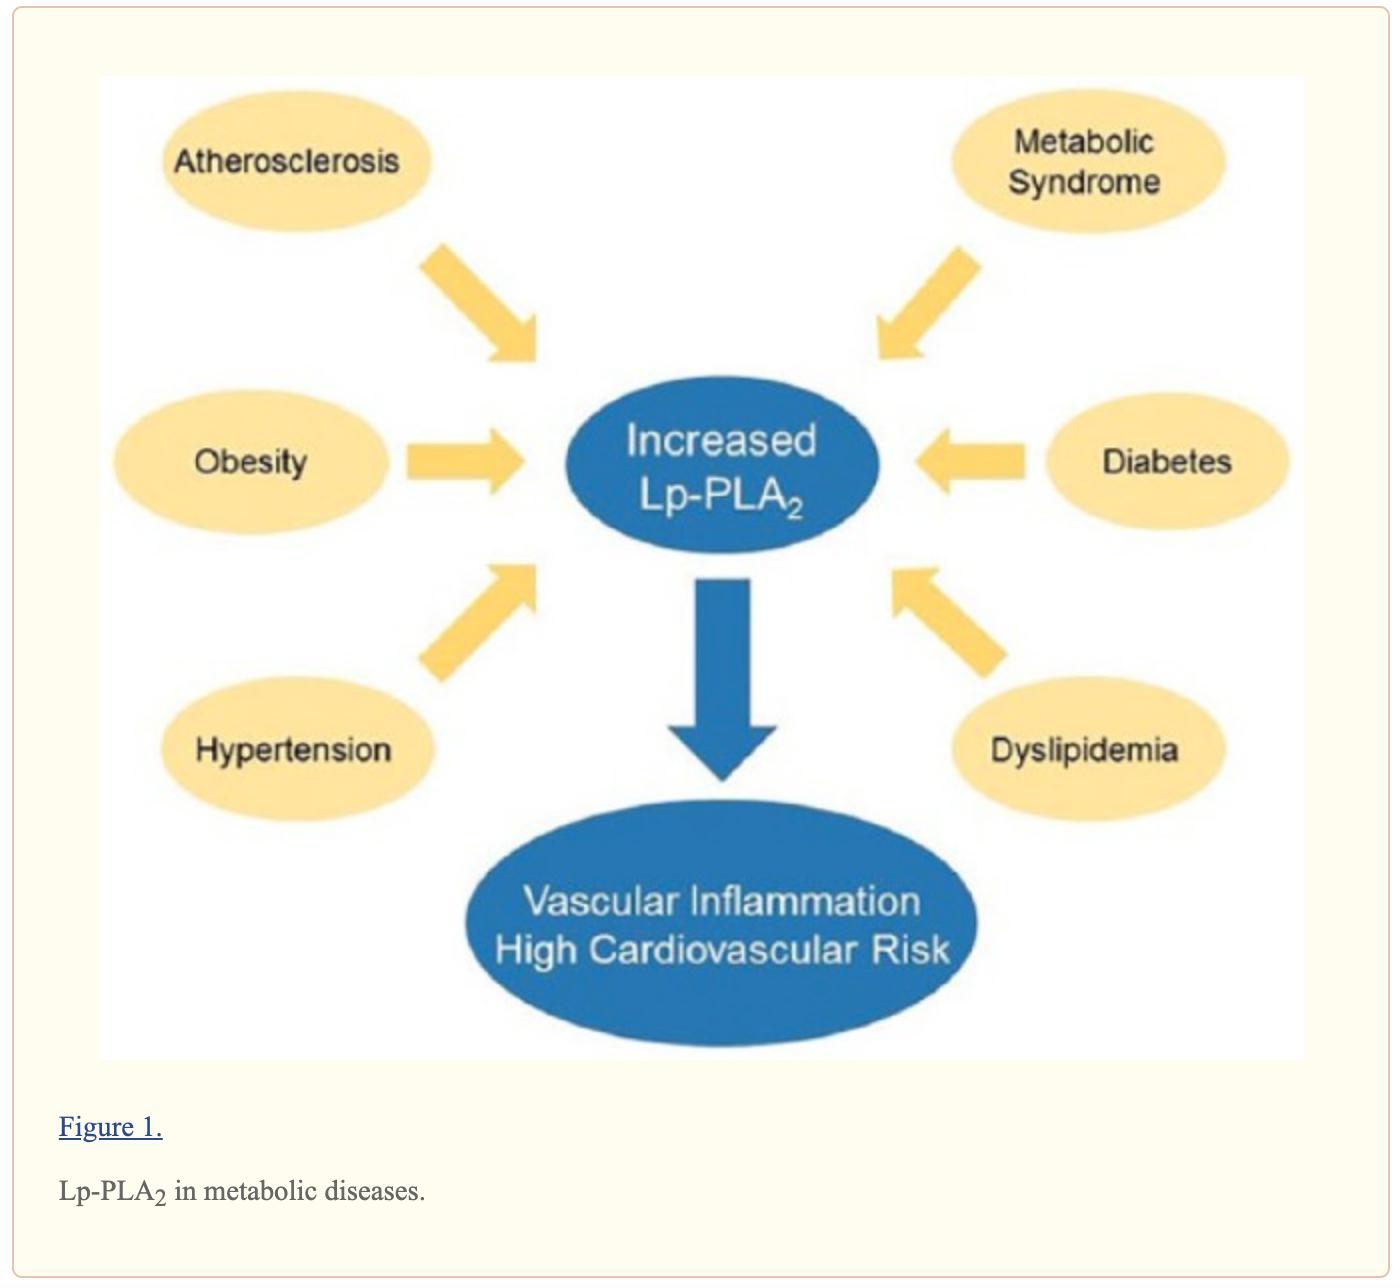 "De Stefano, Alessandro, Liliana Mannucci, Federica Tamburi, Carmine Cardillo, Francesca Schinzari, Valentina Rovella, Steven Nisticò, Luigi Bennardo, Nicola Di Daniele, and Manfredi Tesauro. ""Lp-PLA 2 , a New Biomarker of Vascular Disorders in Metabolic Diseases.""  International Journal of Immunopathology and Pharmacology  33 (January 2019): 205873841982715.  https://doi.org/10.1177/2058738419827154 ."